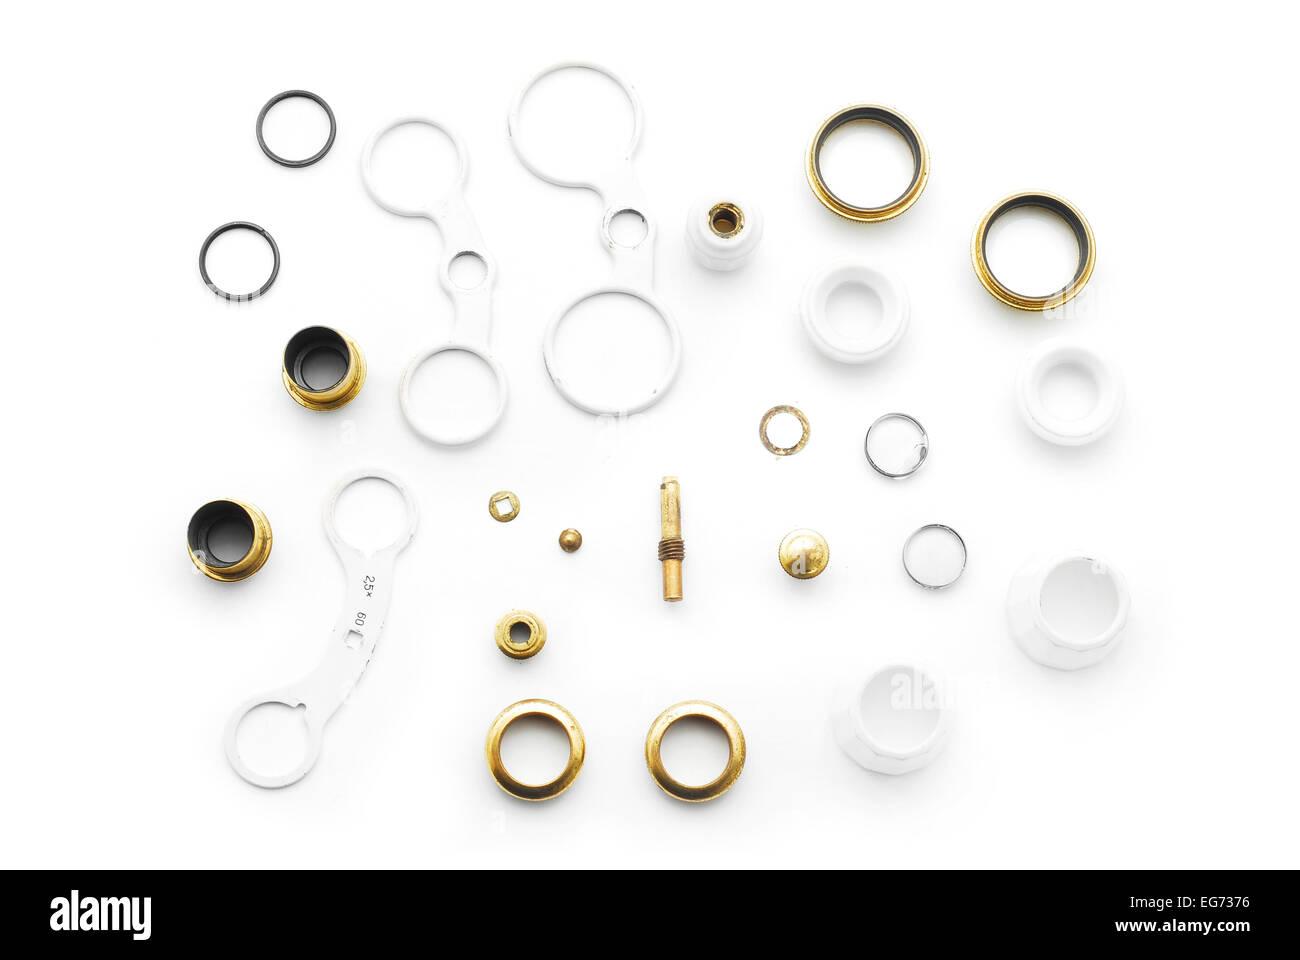 disassembled binocular parts on white - Stock Image